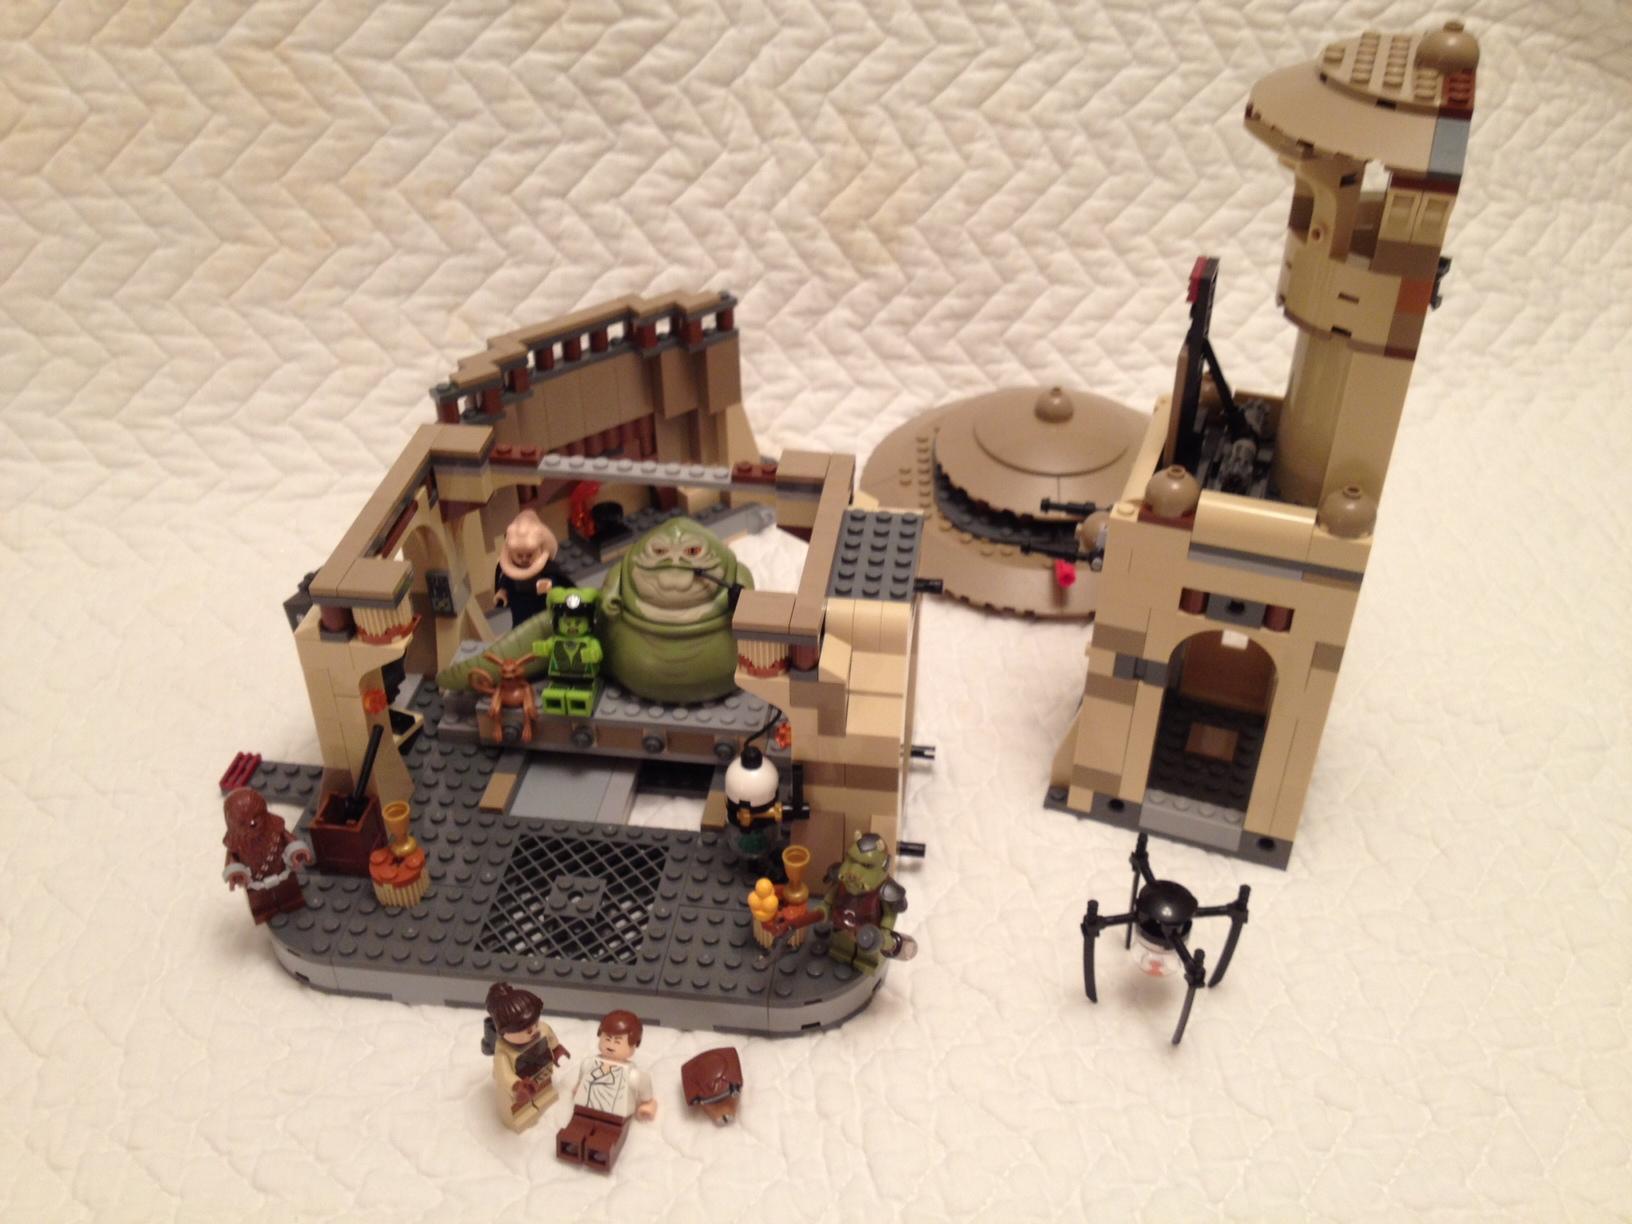 Lego Star Wars Jabbas Palace 9516 Brick Radar